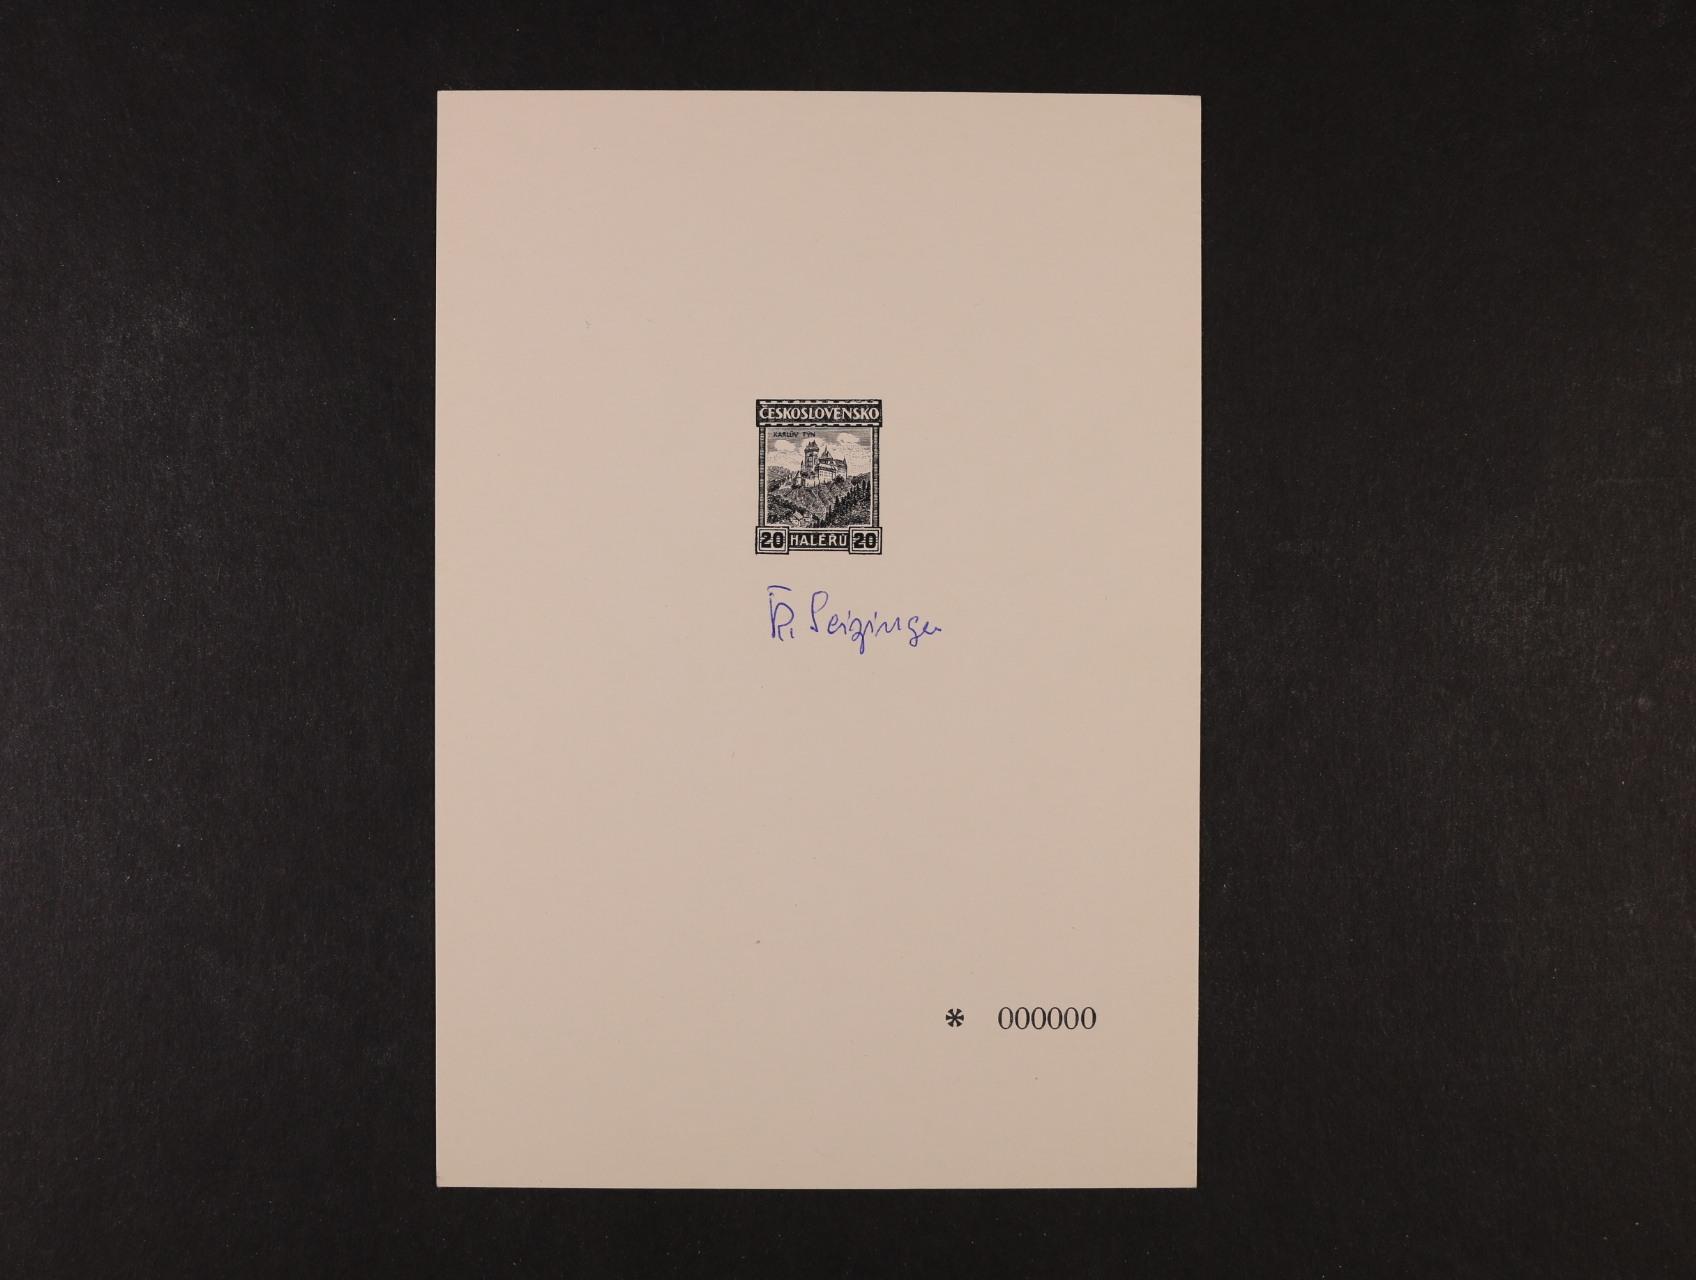 PT 9b anulát s podpisem autora zn. R. Seisinger